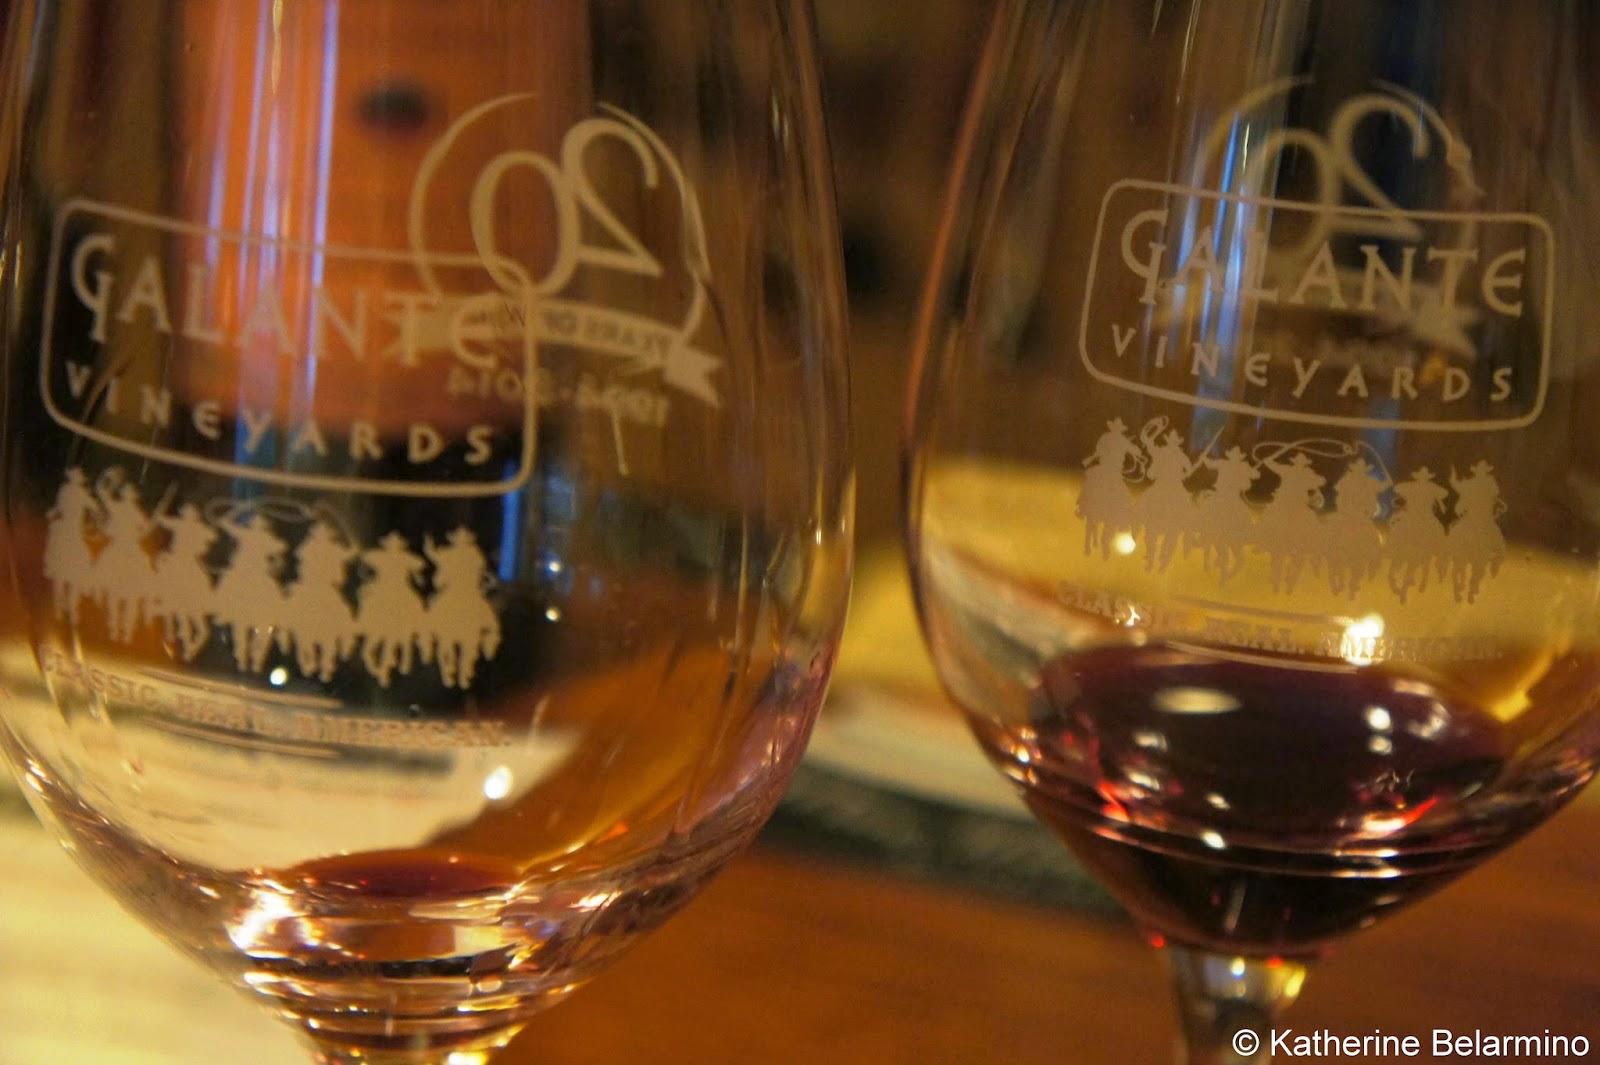 Galante Vineyards Carmel-by-the-Sea California